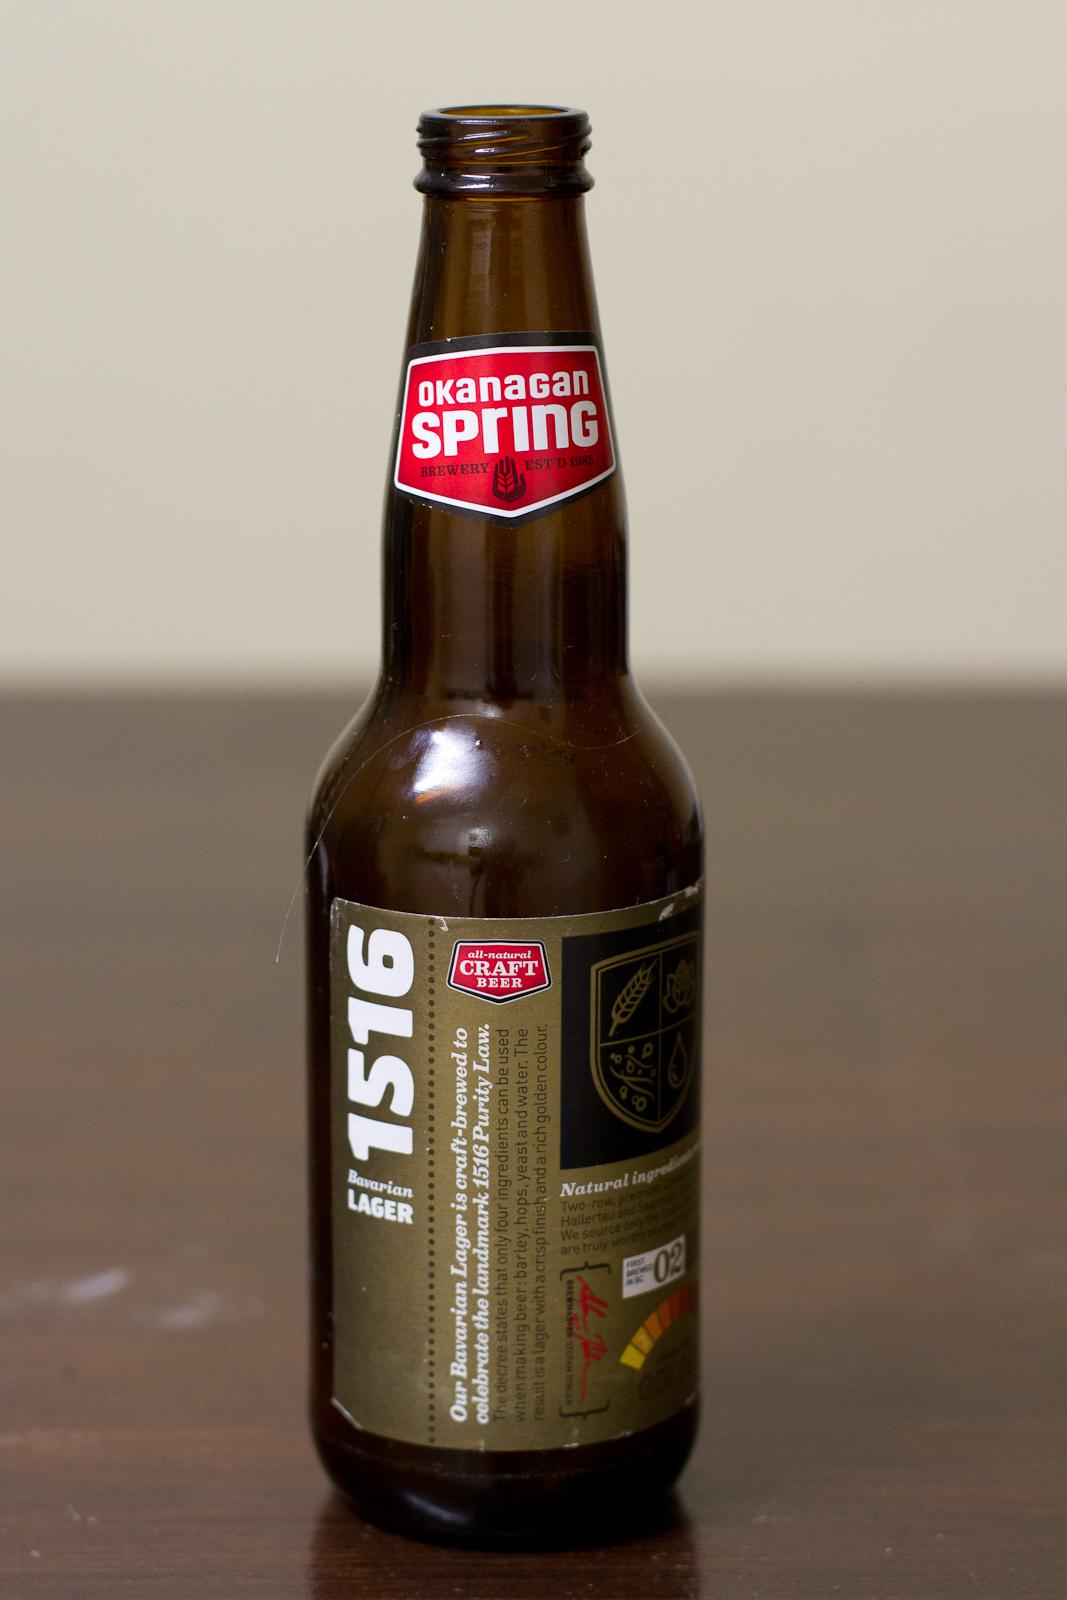 Okanagan Spring Brewery 1516 Lager Beer Me British